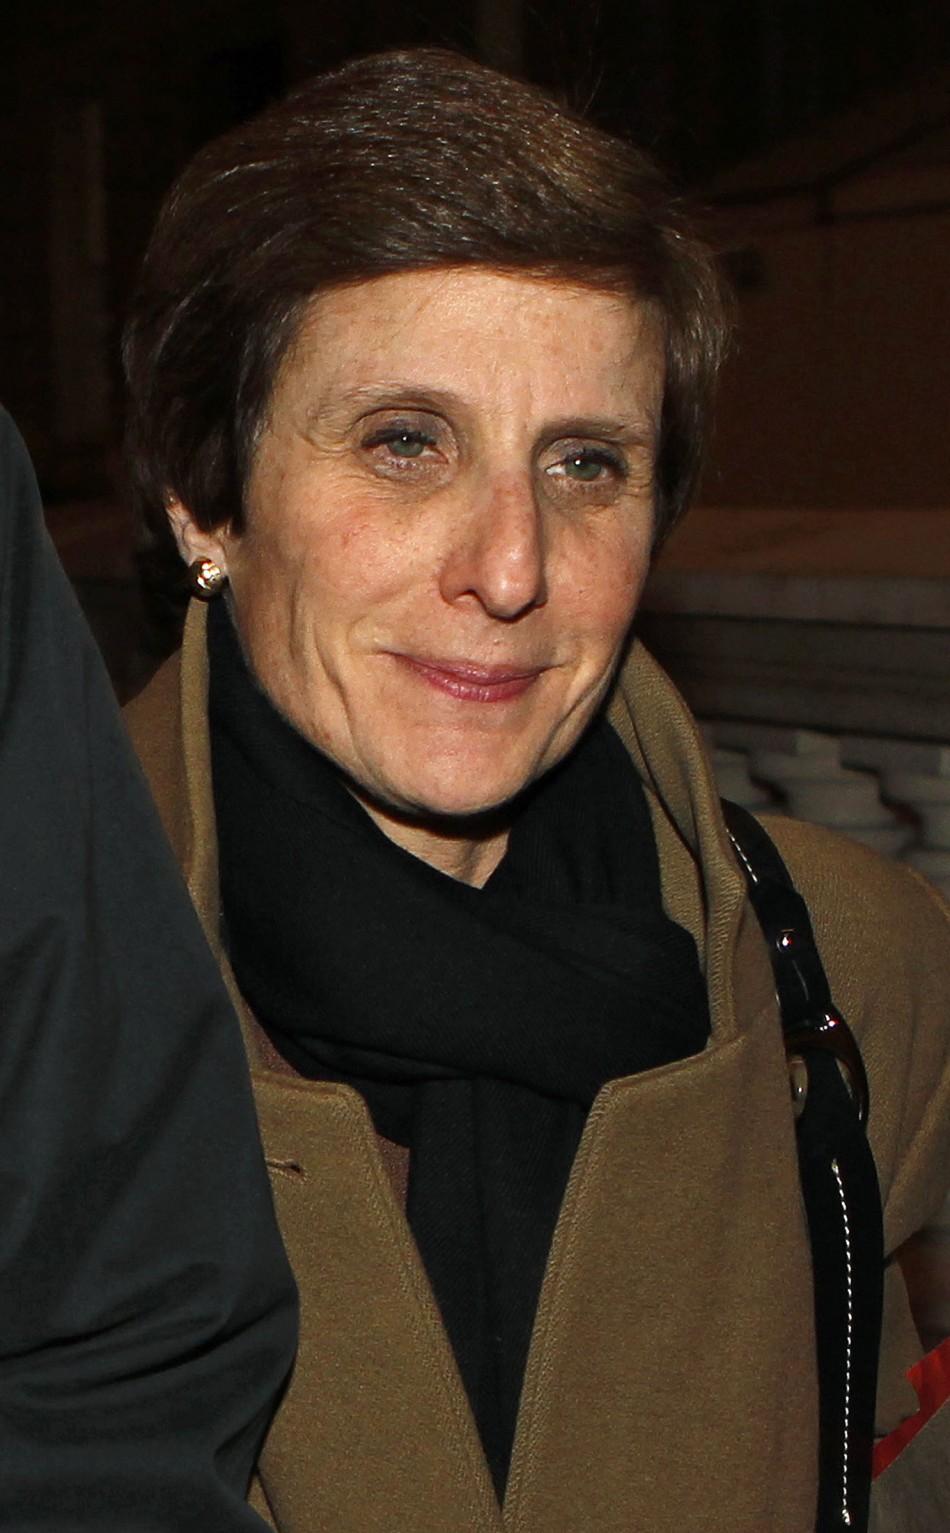 10.Irene Rosenfeld: Chief Executive Officer of Kraft